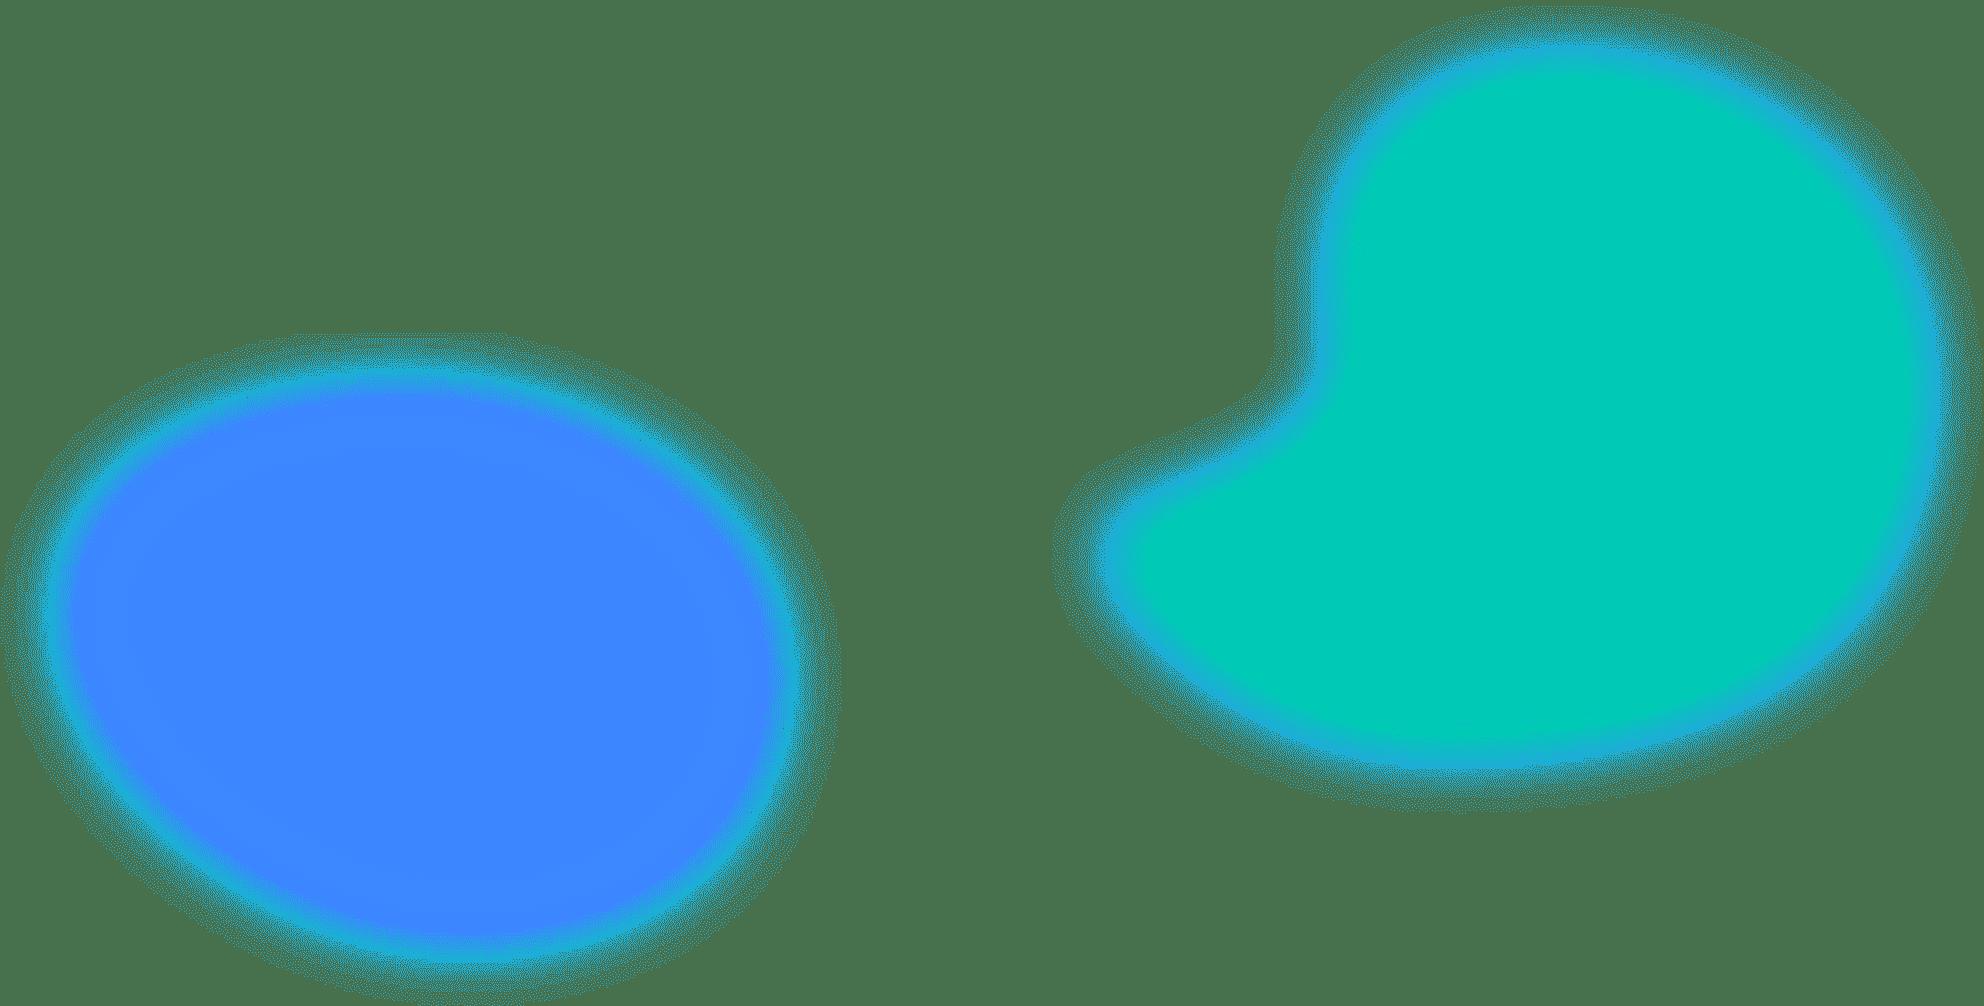 bg-blue-green